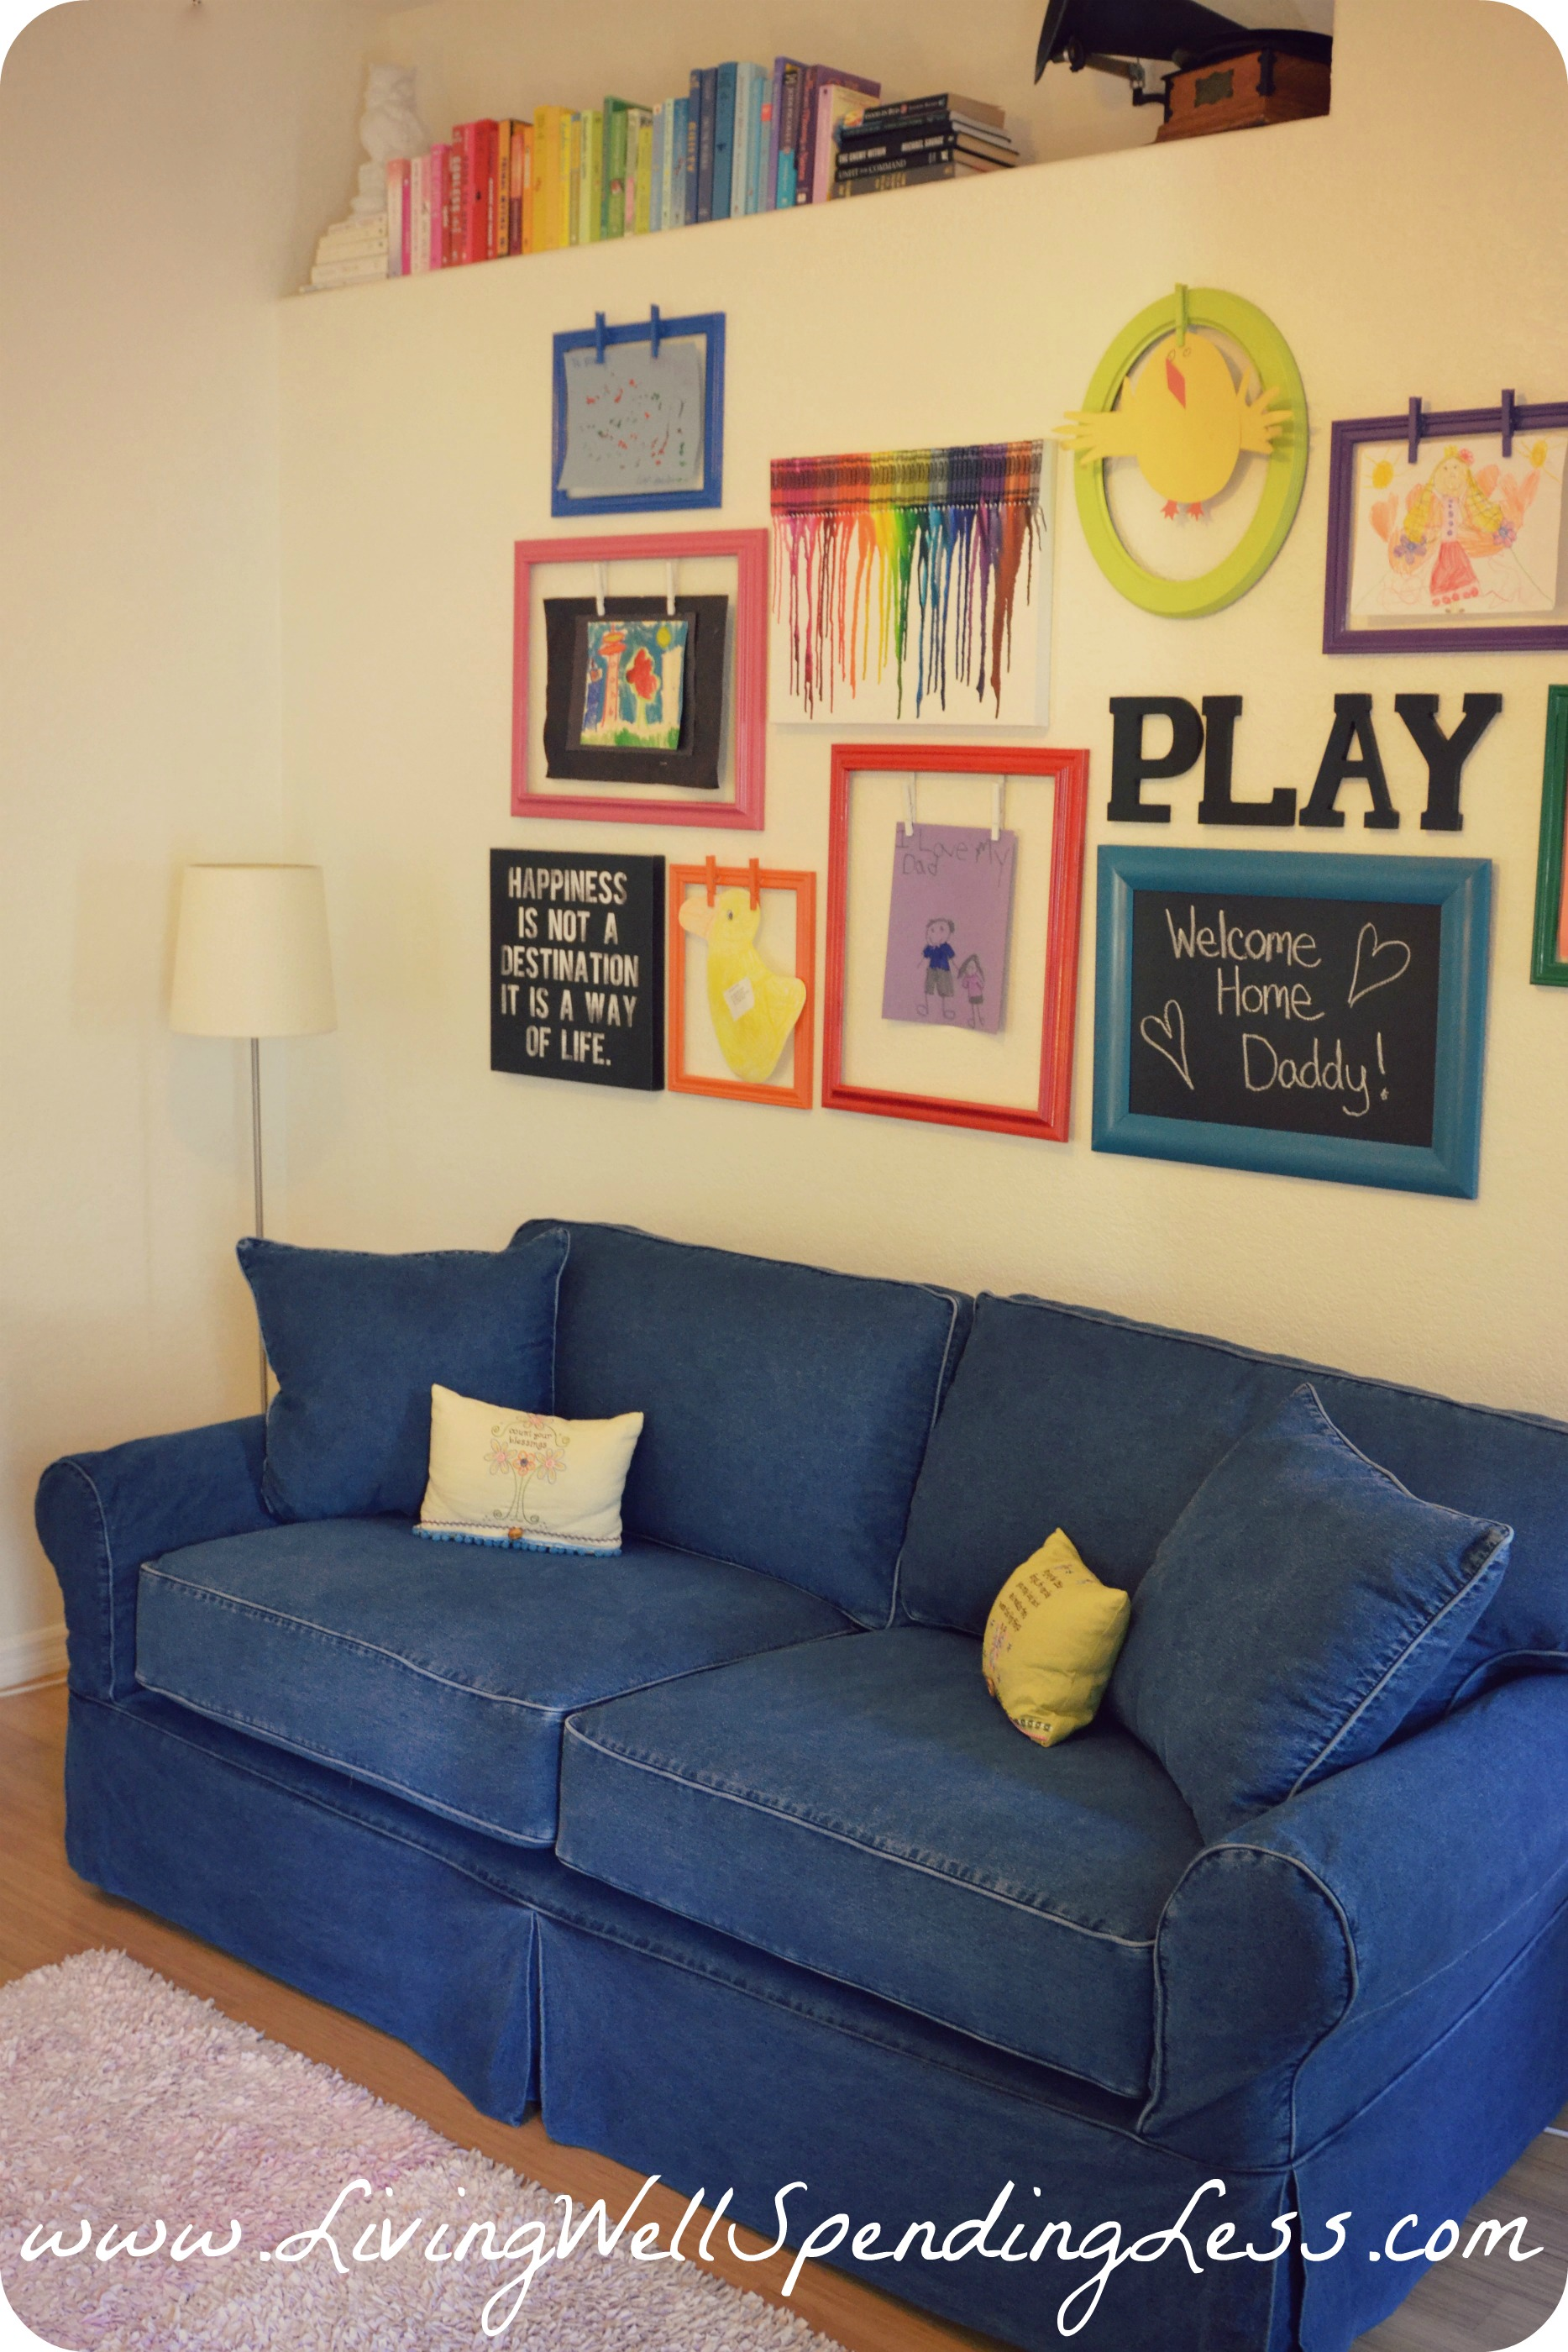 Rainbow family room kids playroom decorating ideas diy family room - Playroom decorating ideas ...